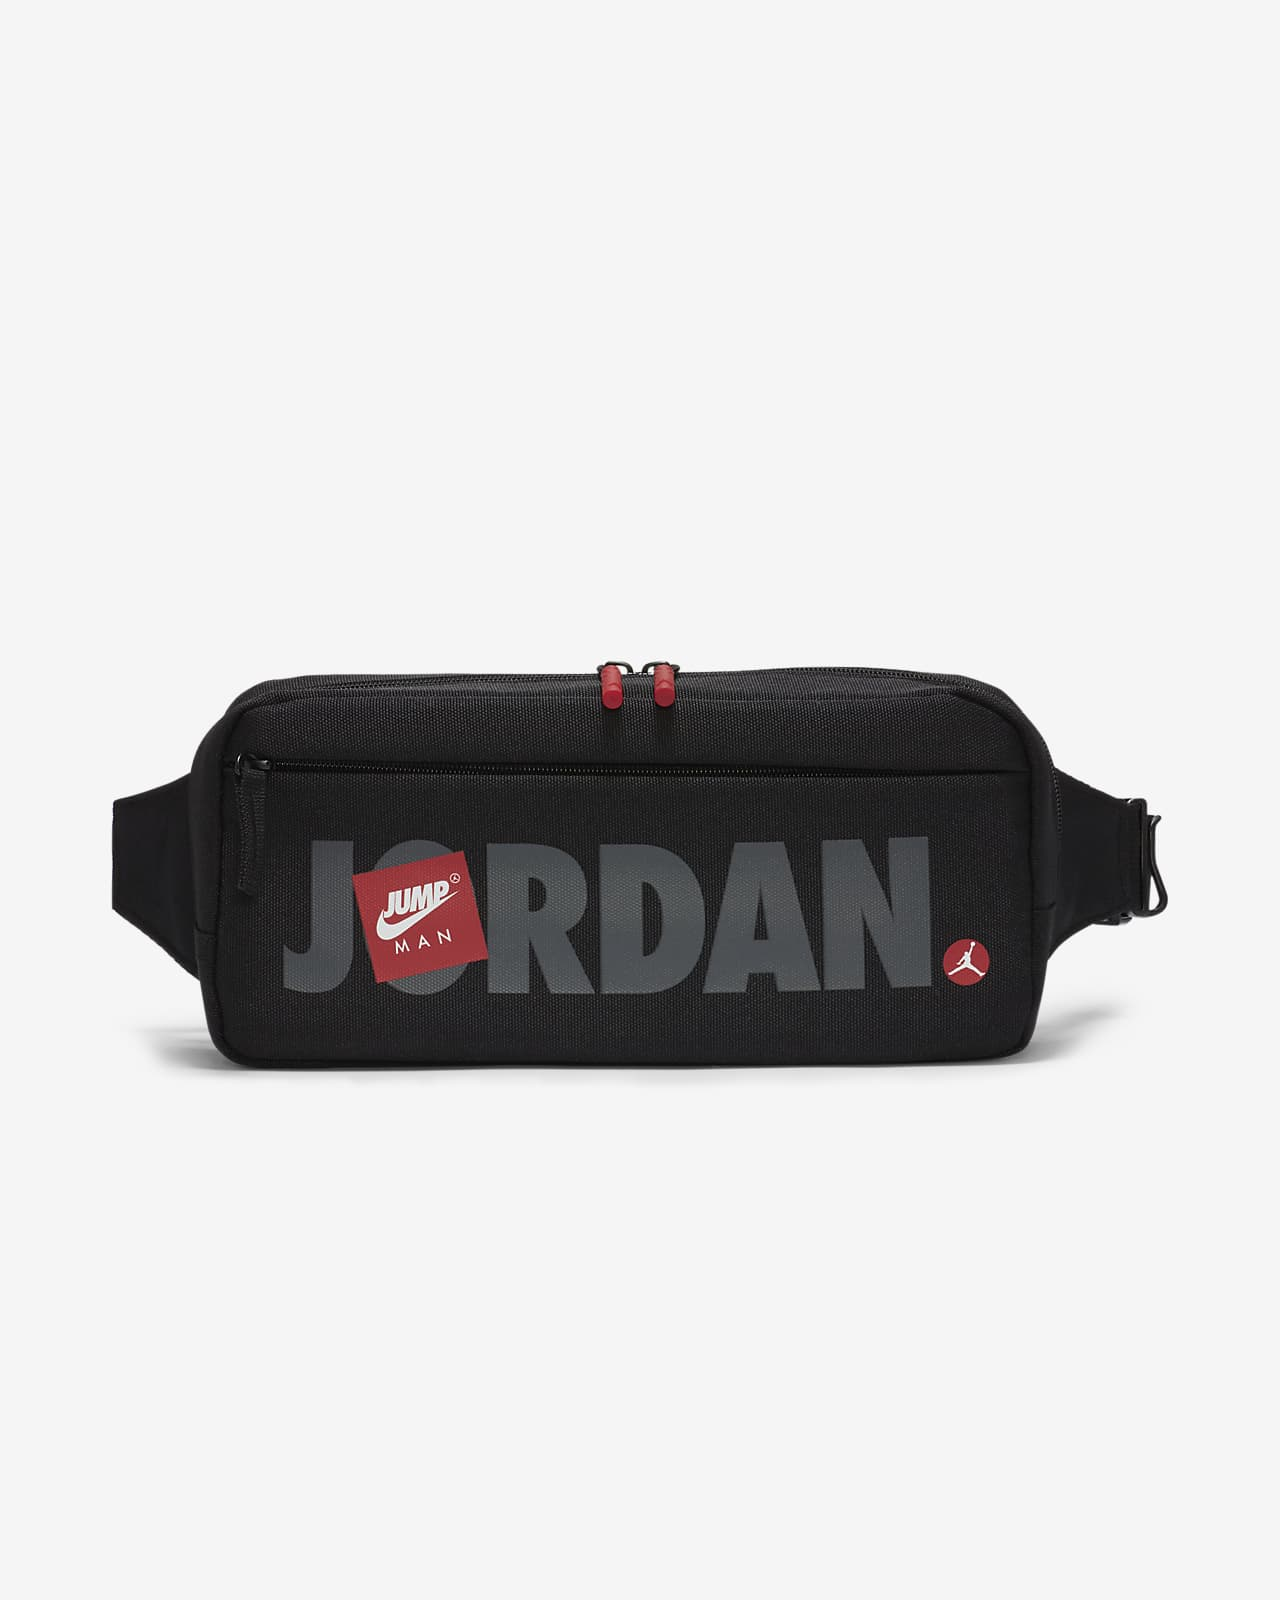 Sac à bandoulière Jordan